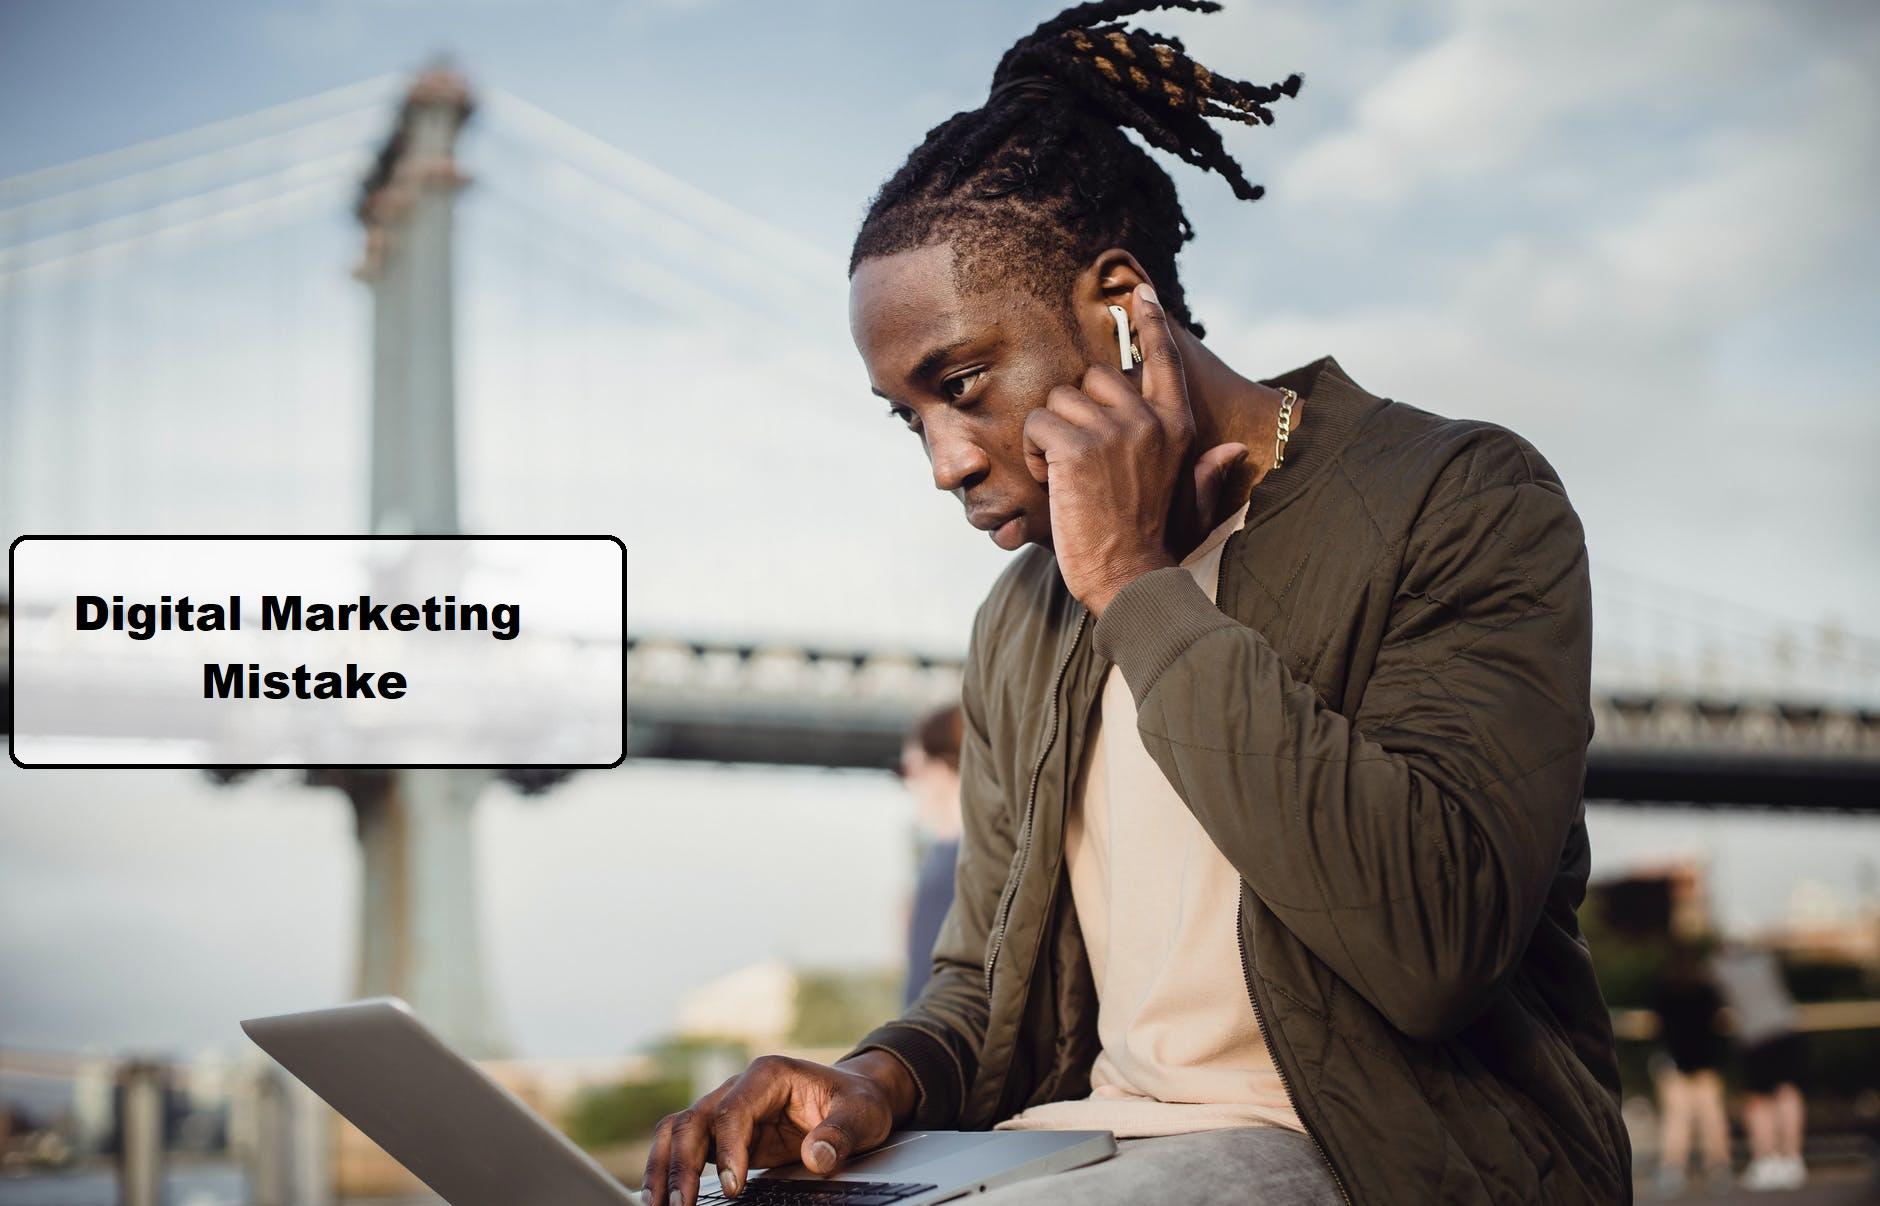 Digital Marketing Mistake